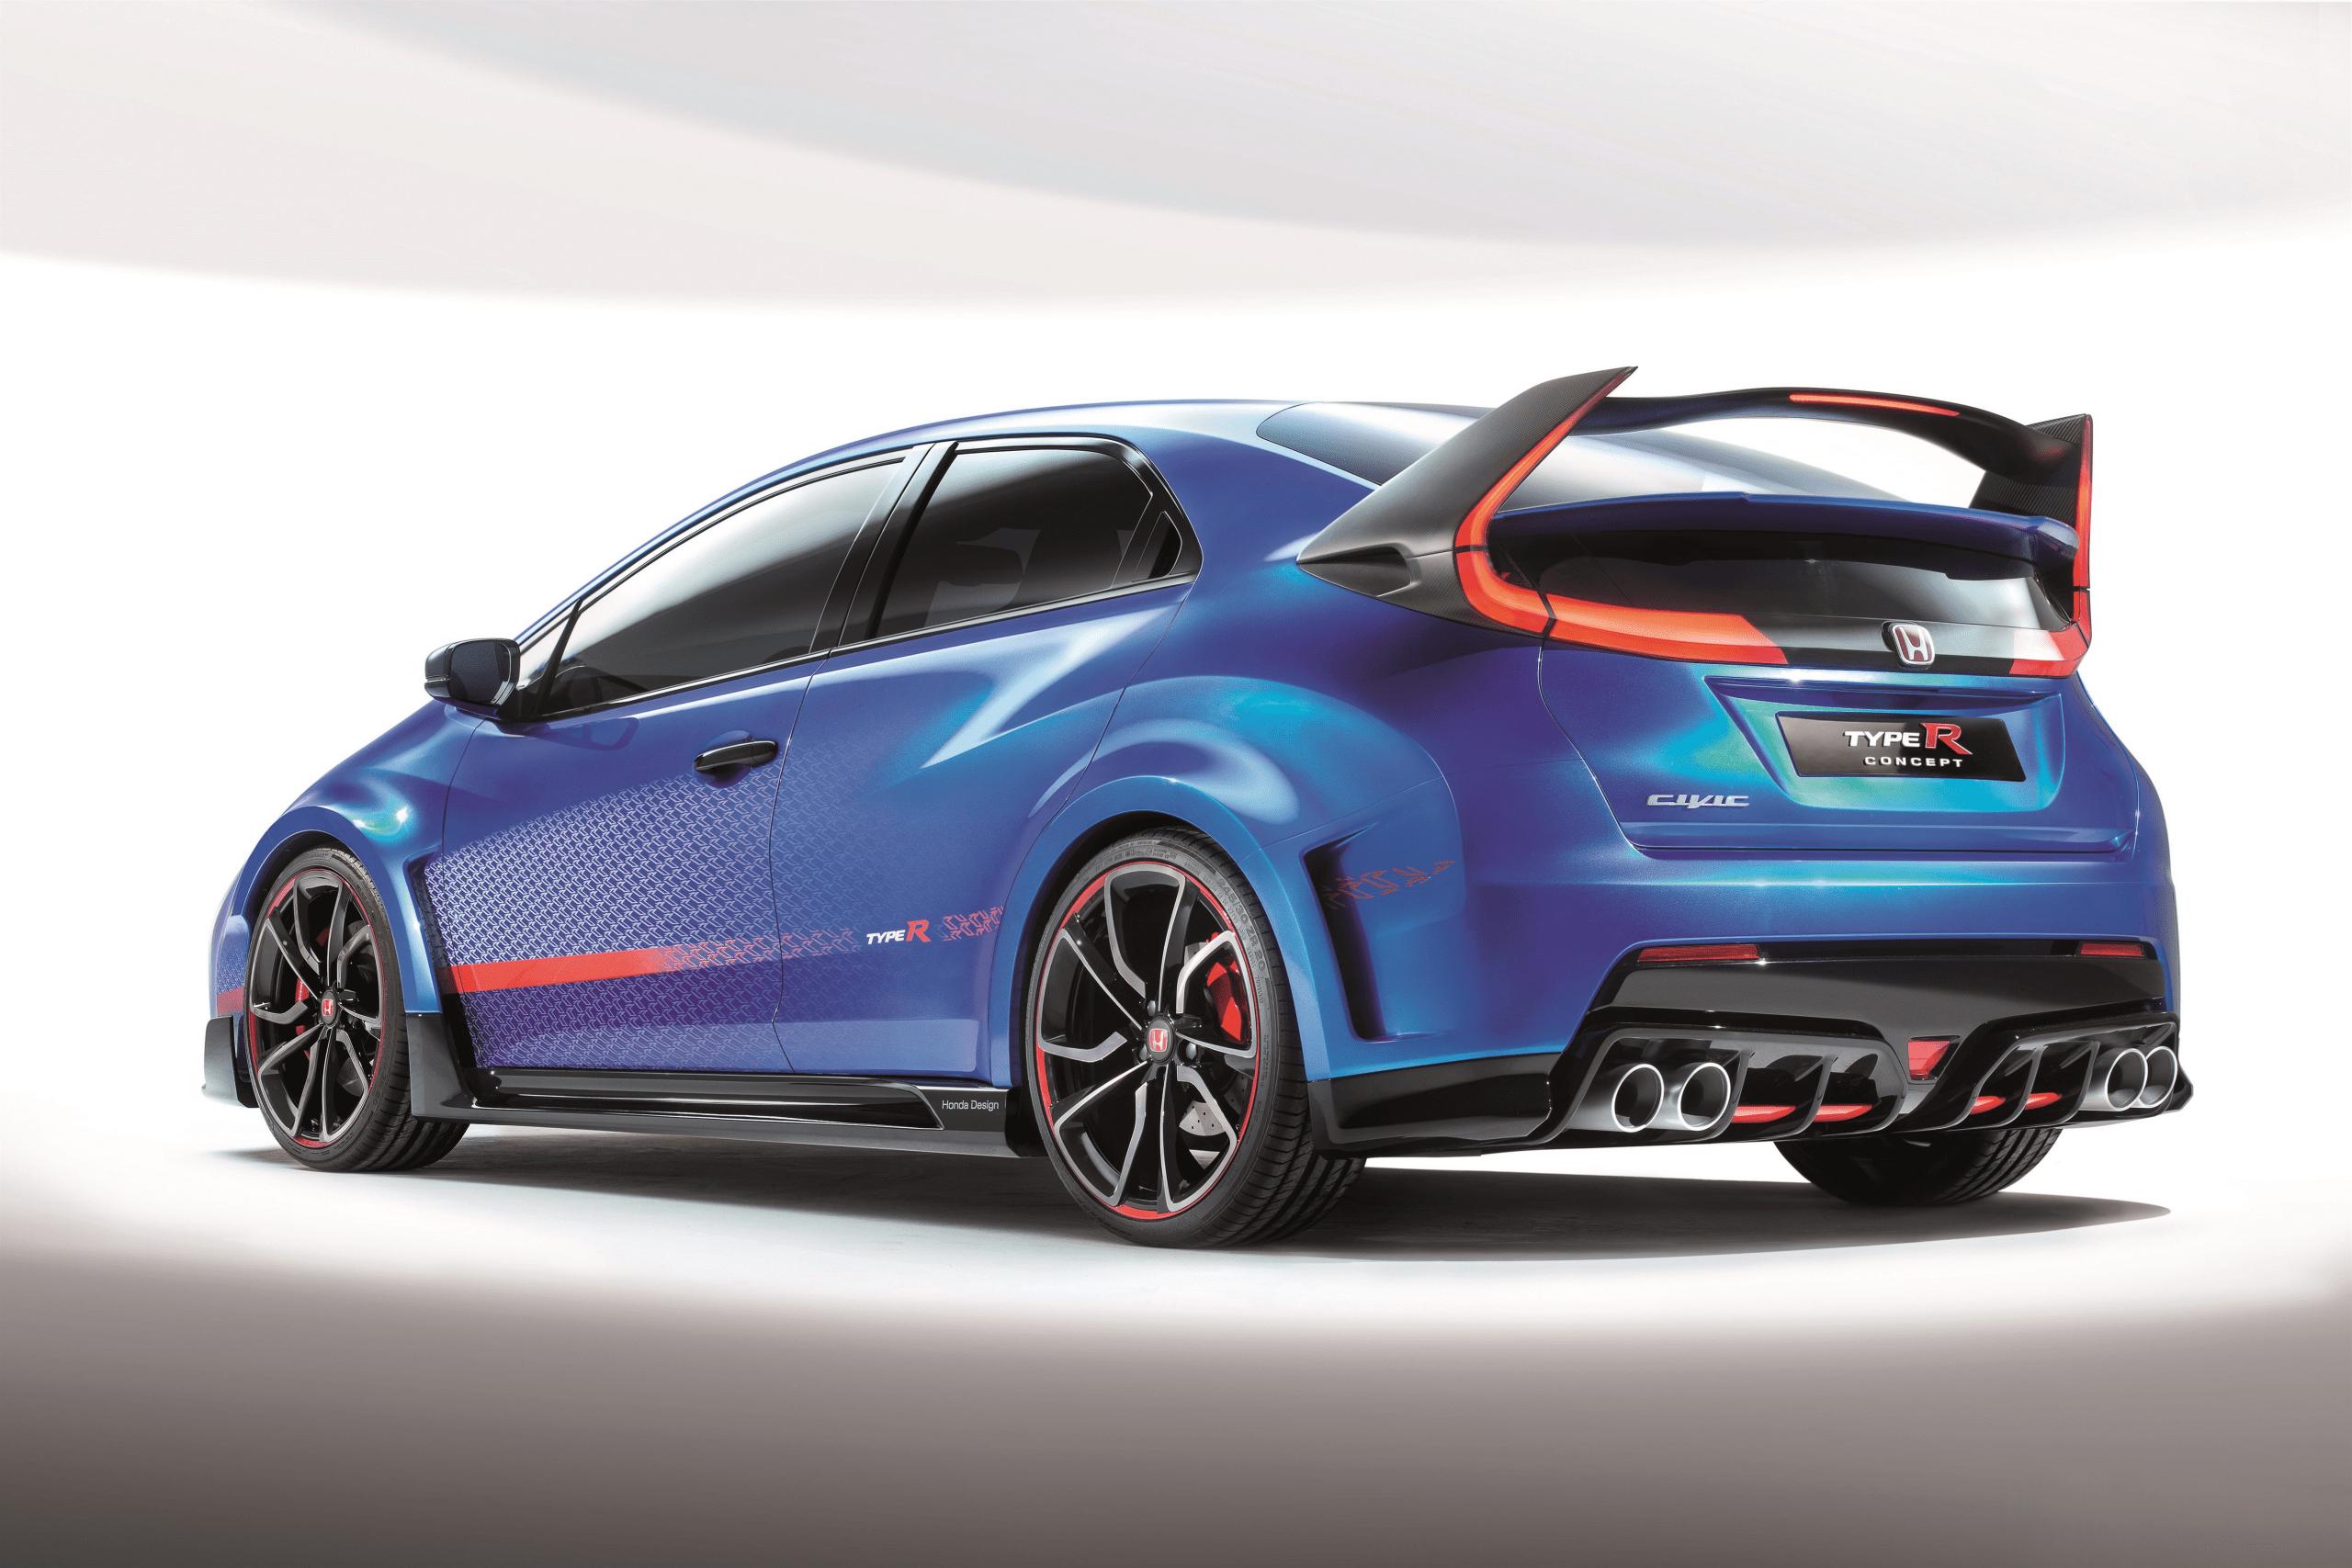 2021 Honda Civic Type R Photos in 2020 Honda civic type